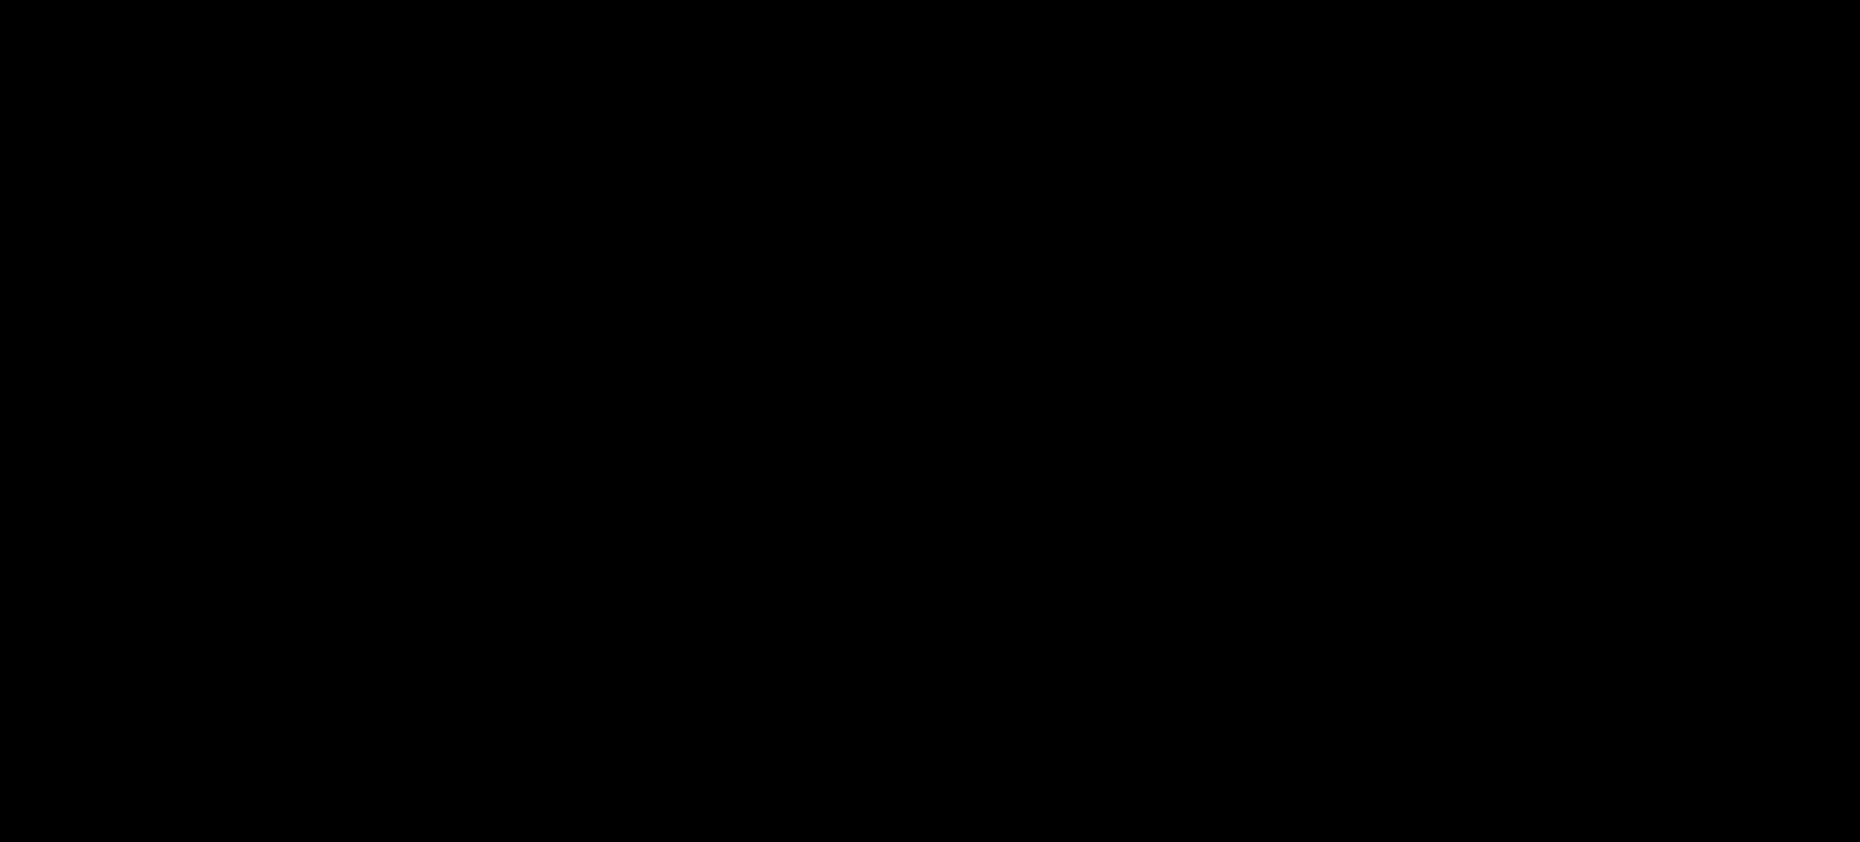 Dacomitinib (PF 299804)